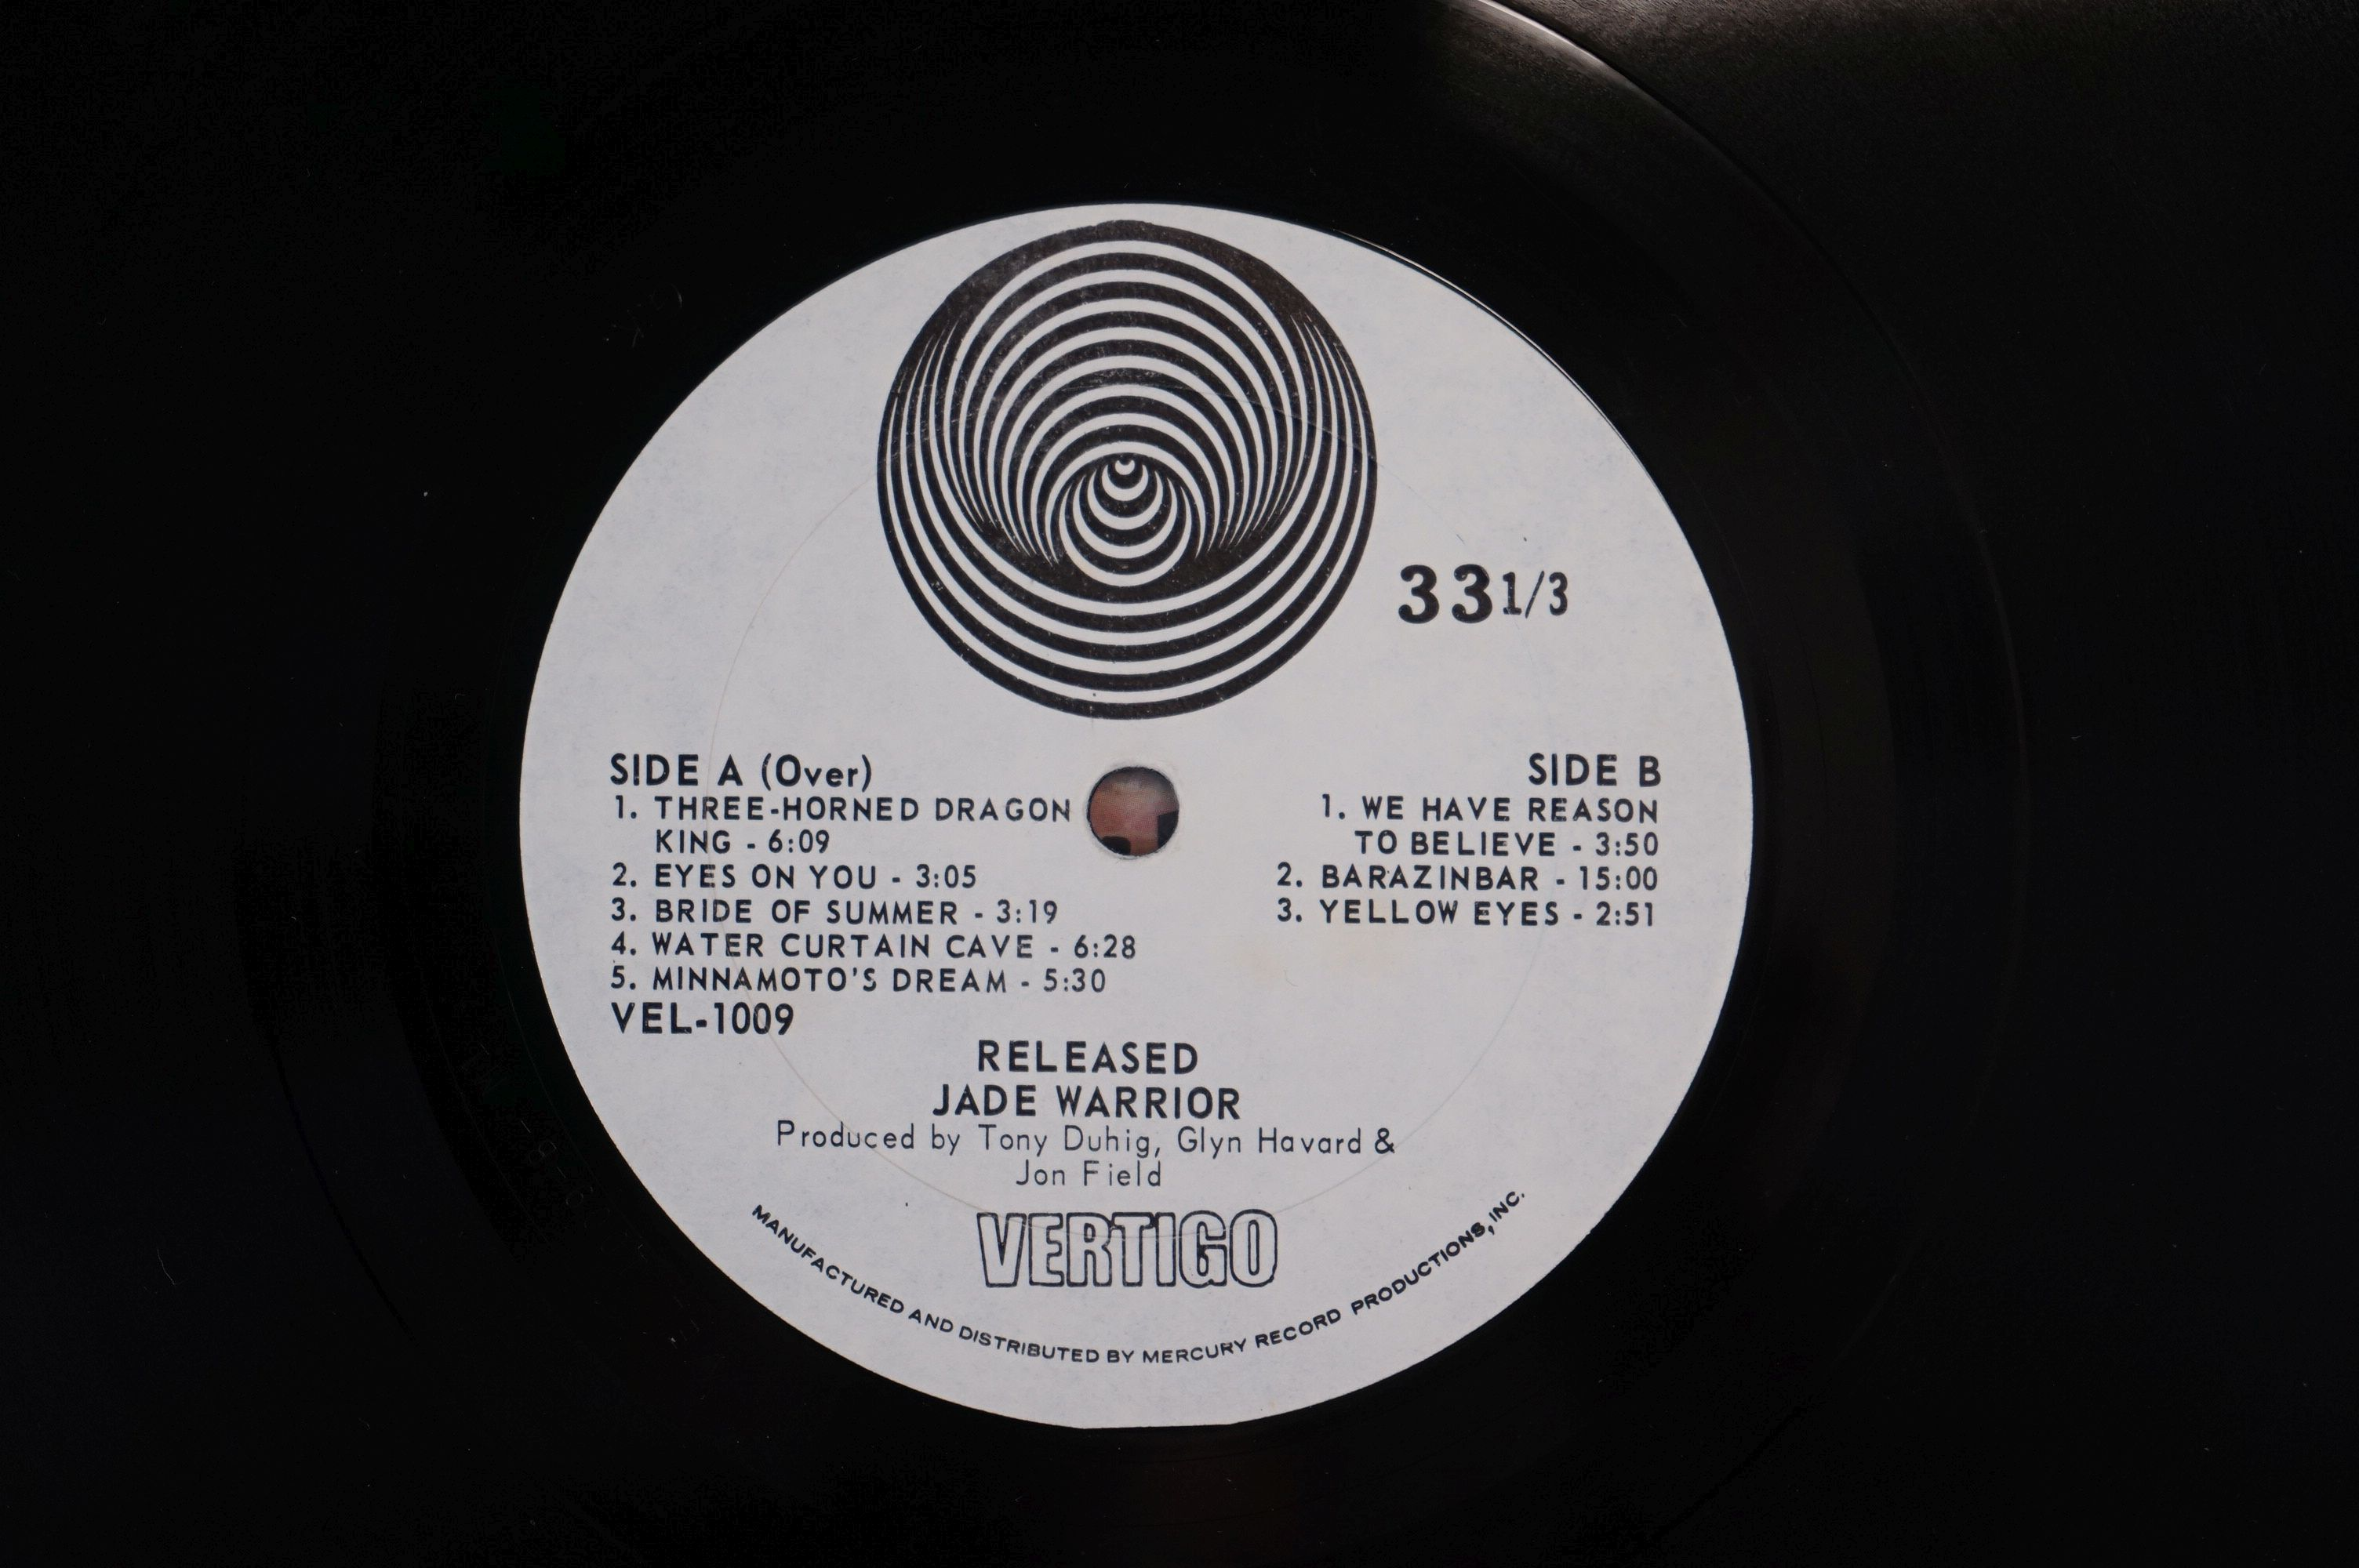 Vinyl - Four Jade Warrior LPs to include Last Autumn Dream LP on Vertigo Deluxe 6360079 gatefold - Image 6 of 9